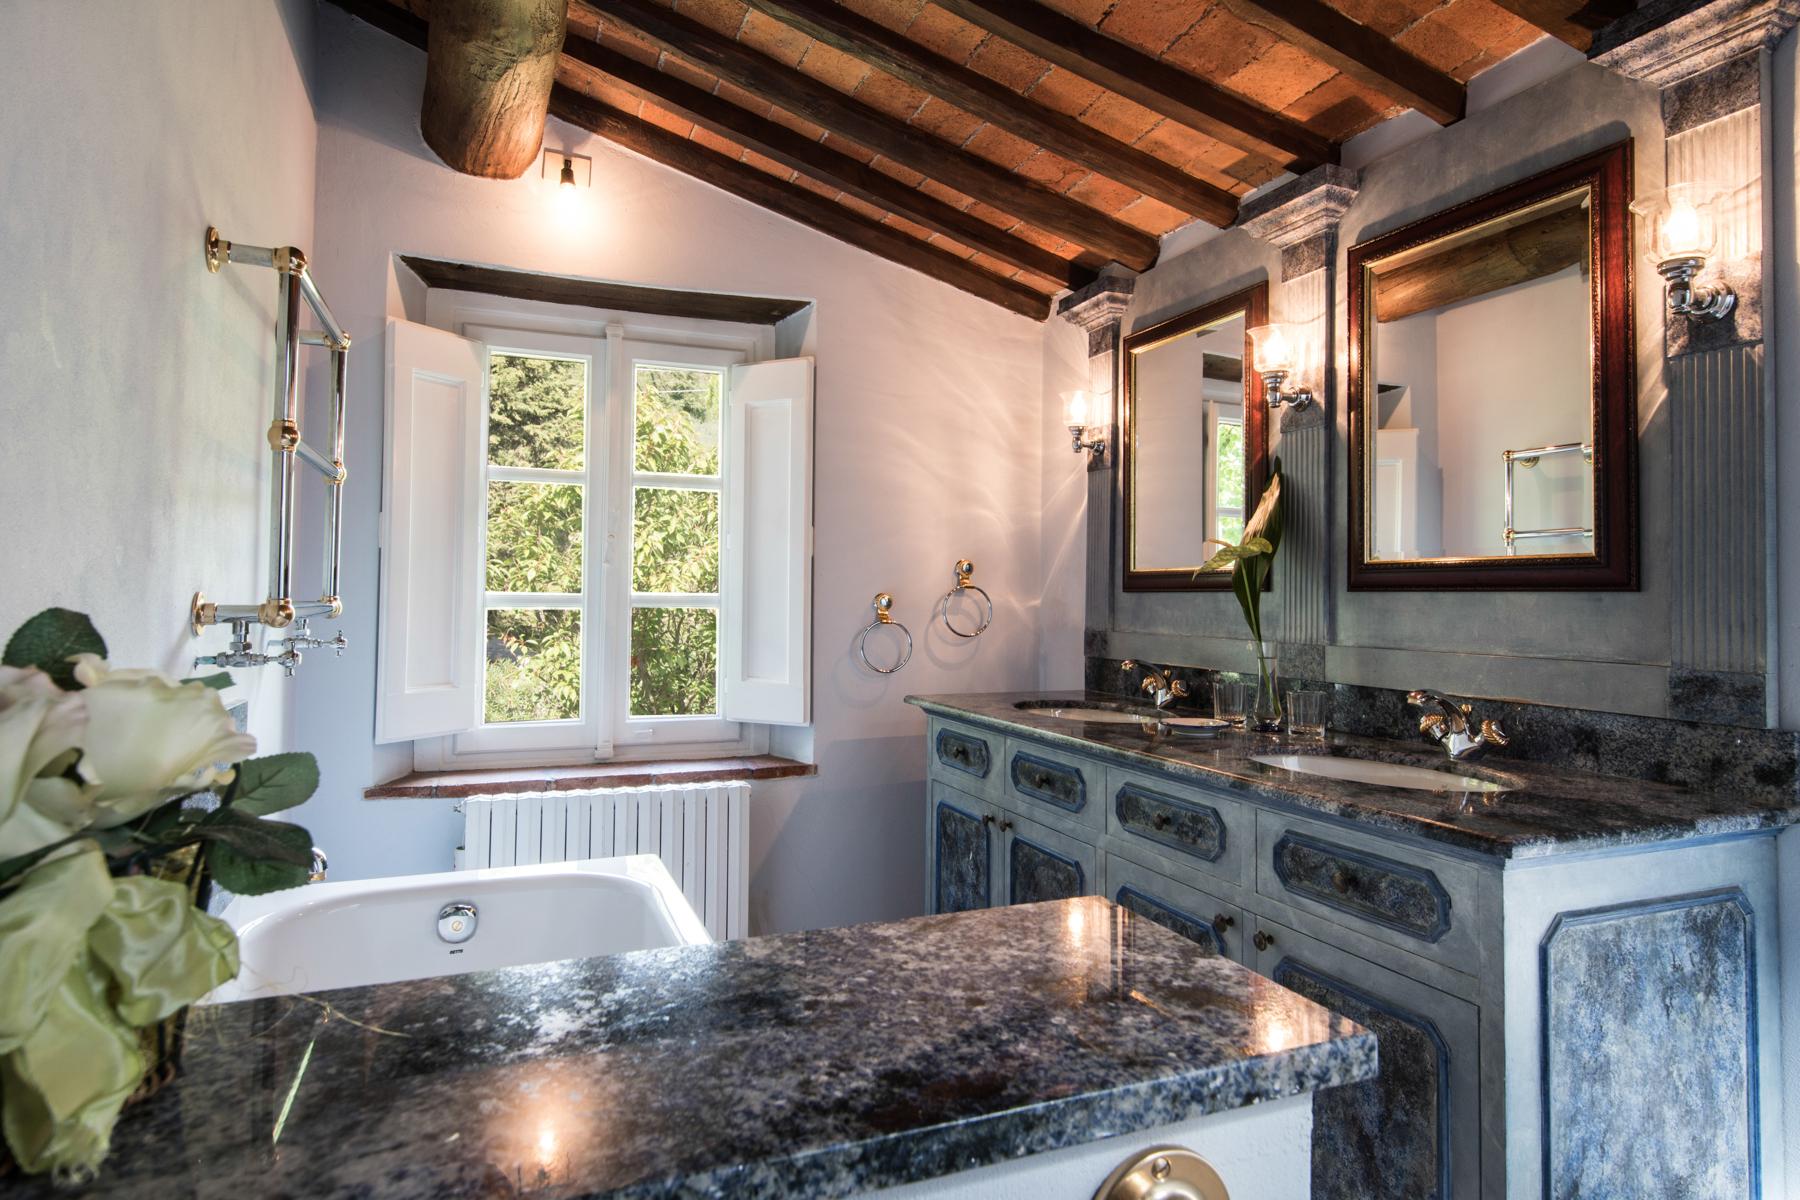 Villa in Vendita a Lucca: 5 locali, 1065 mq - Foto 23